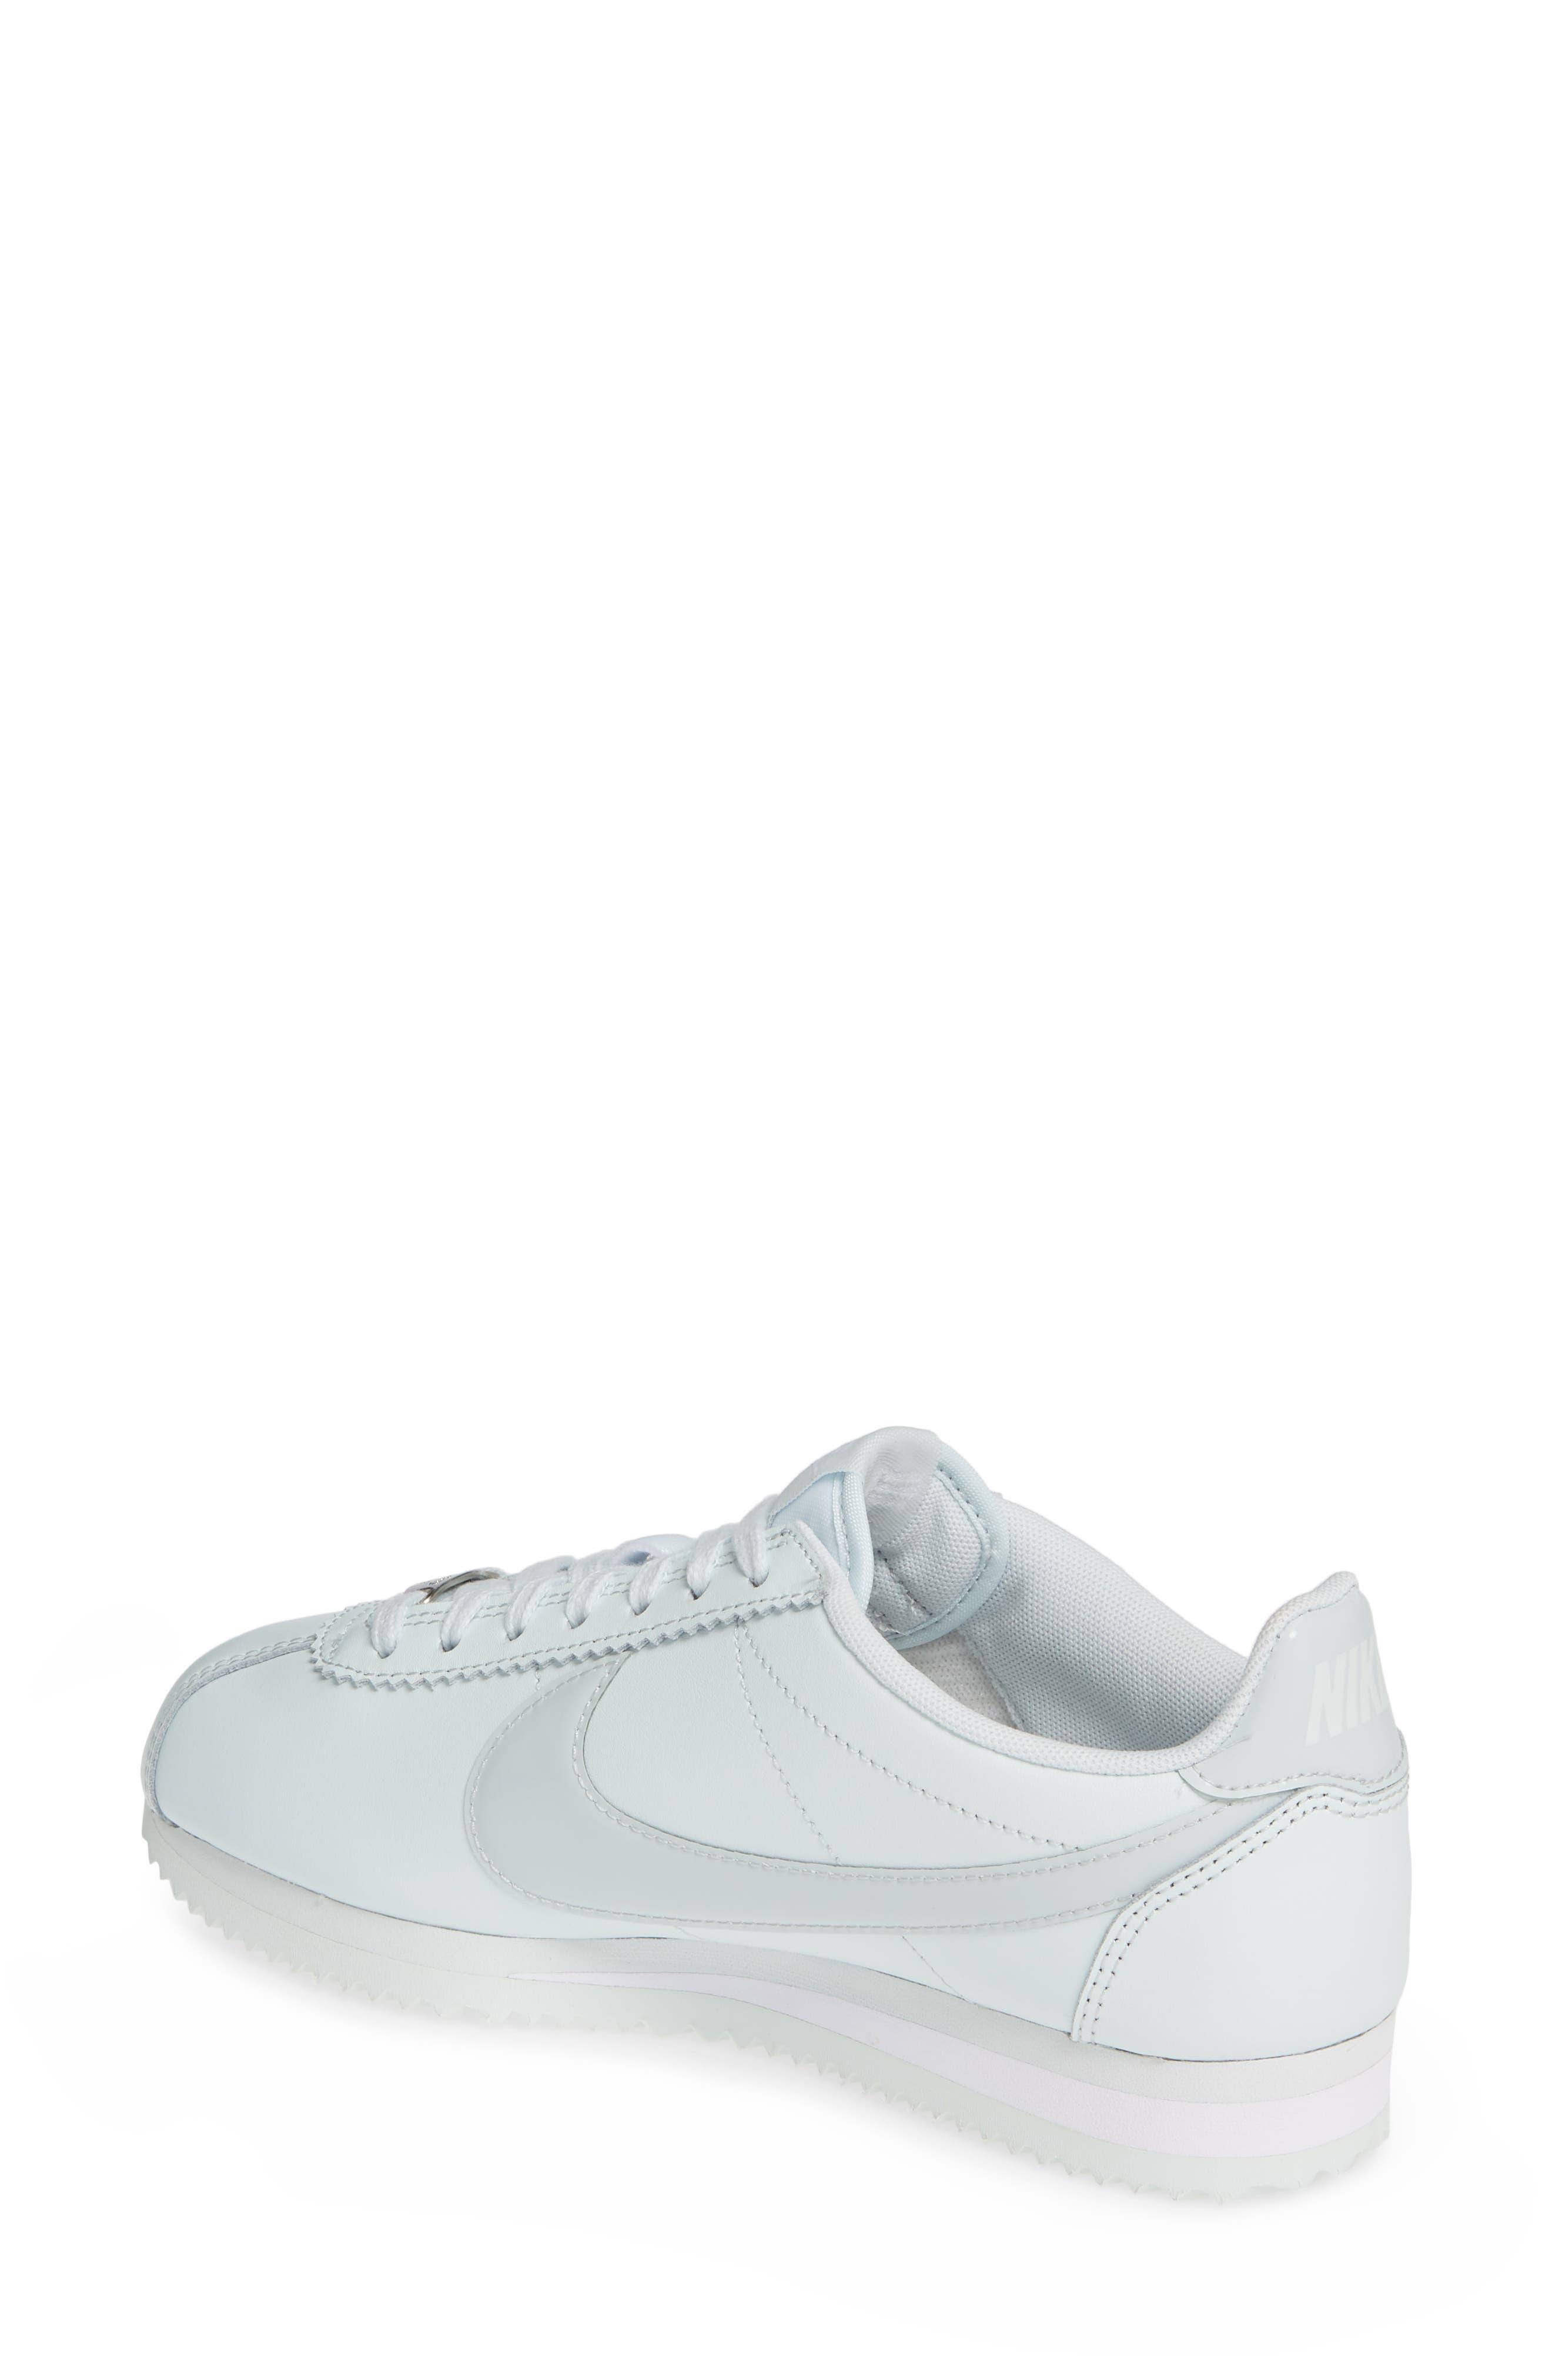 NIKE, Classic Cortez Premium XLV Sneaker, Alternate thumbnail 2, color, BARELY GREY/ WHITE